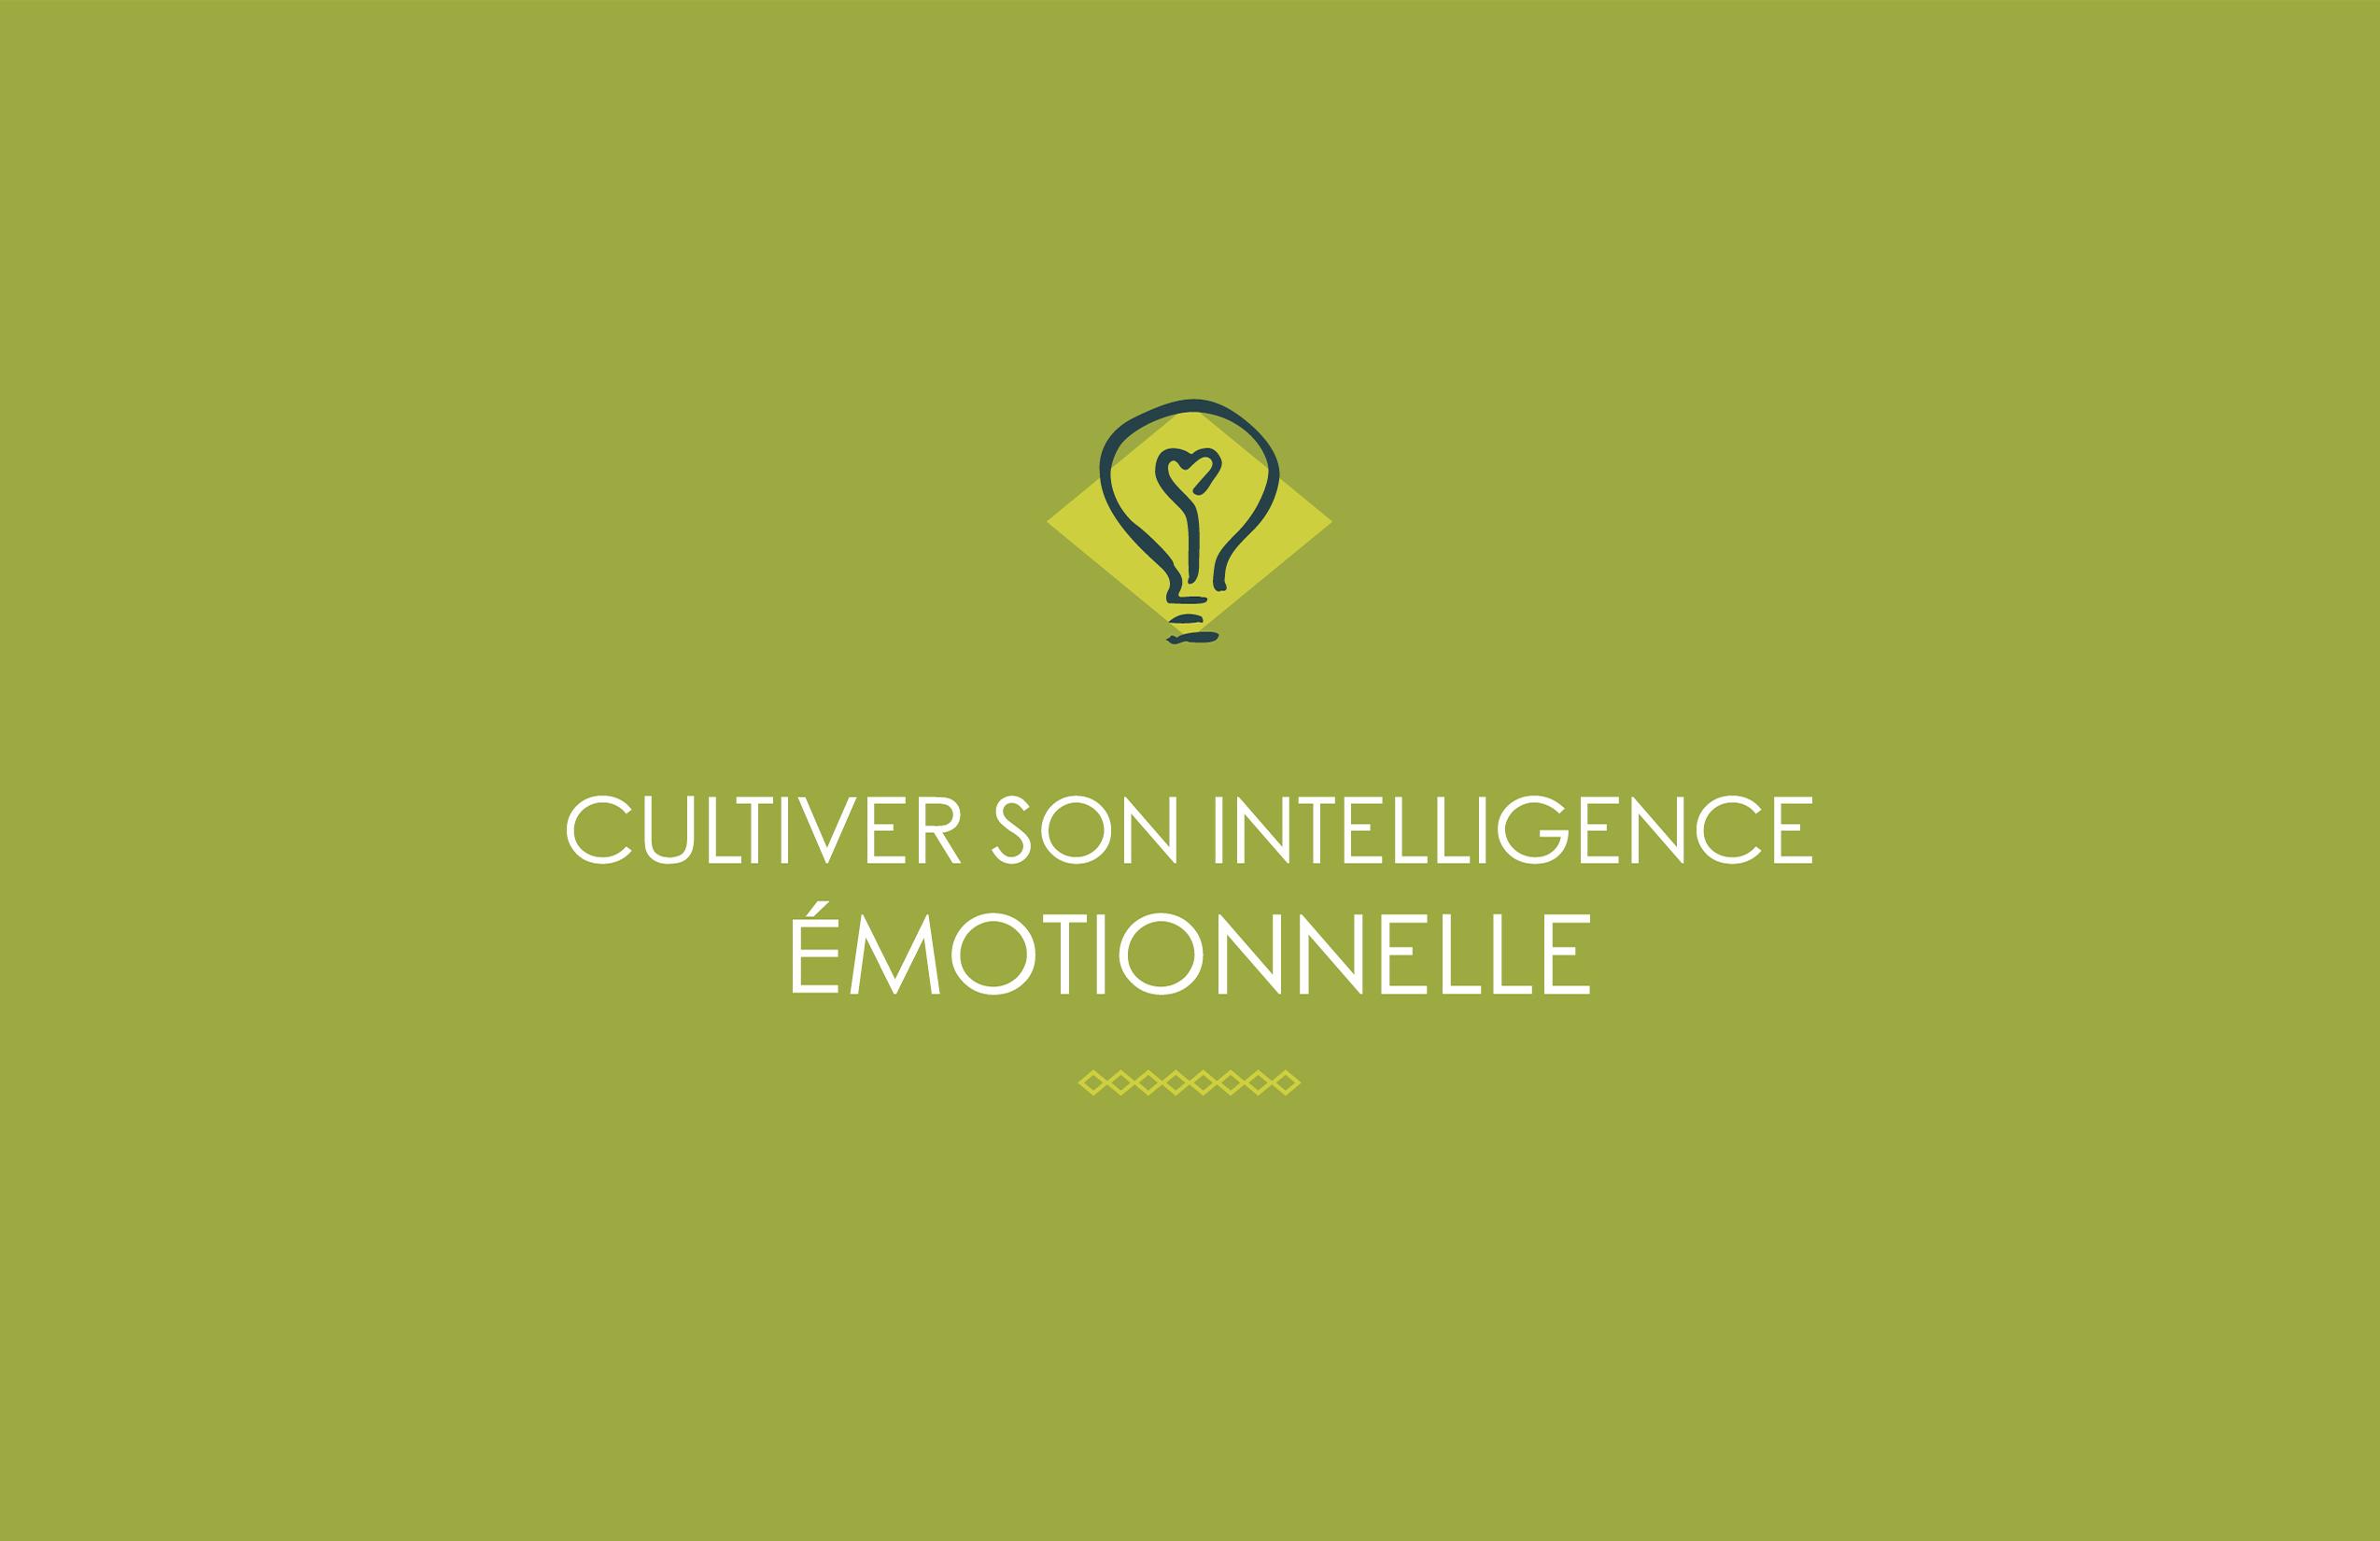 cultiver son intelligence emotionnelle